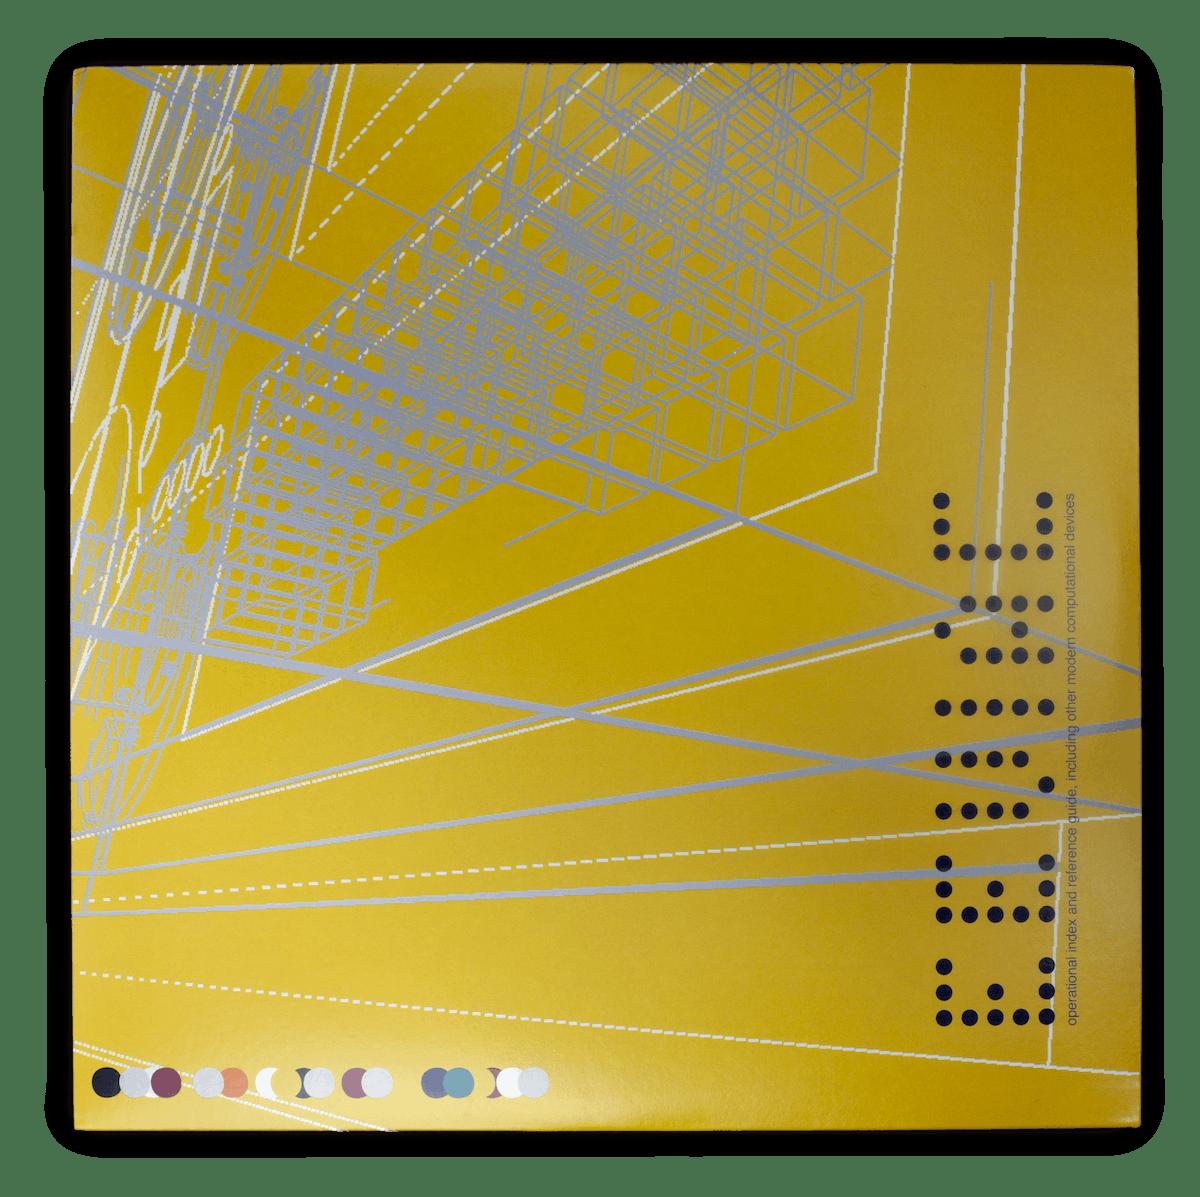 A vinyl record by Man or Astroman